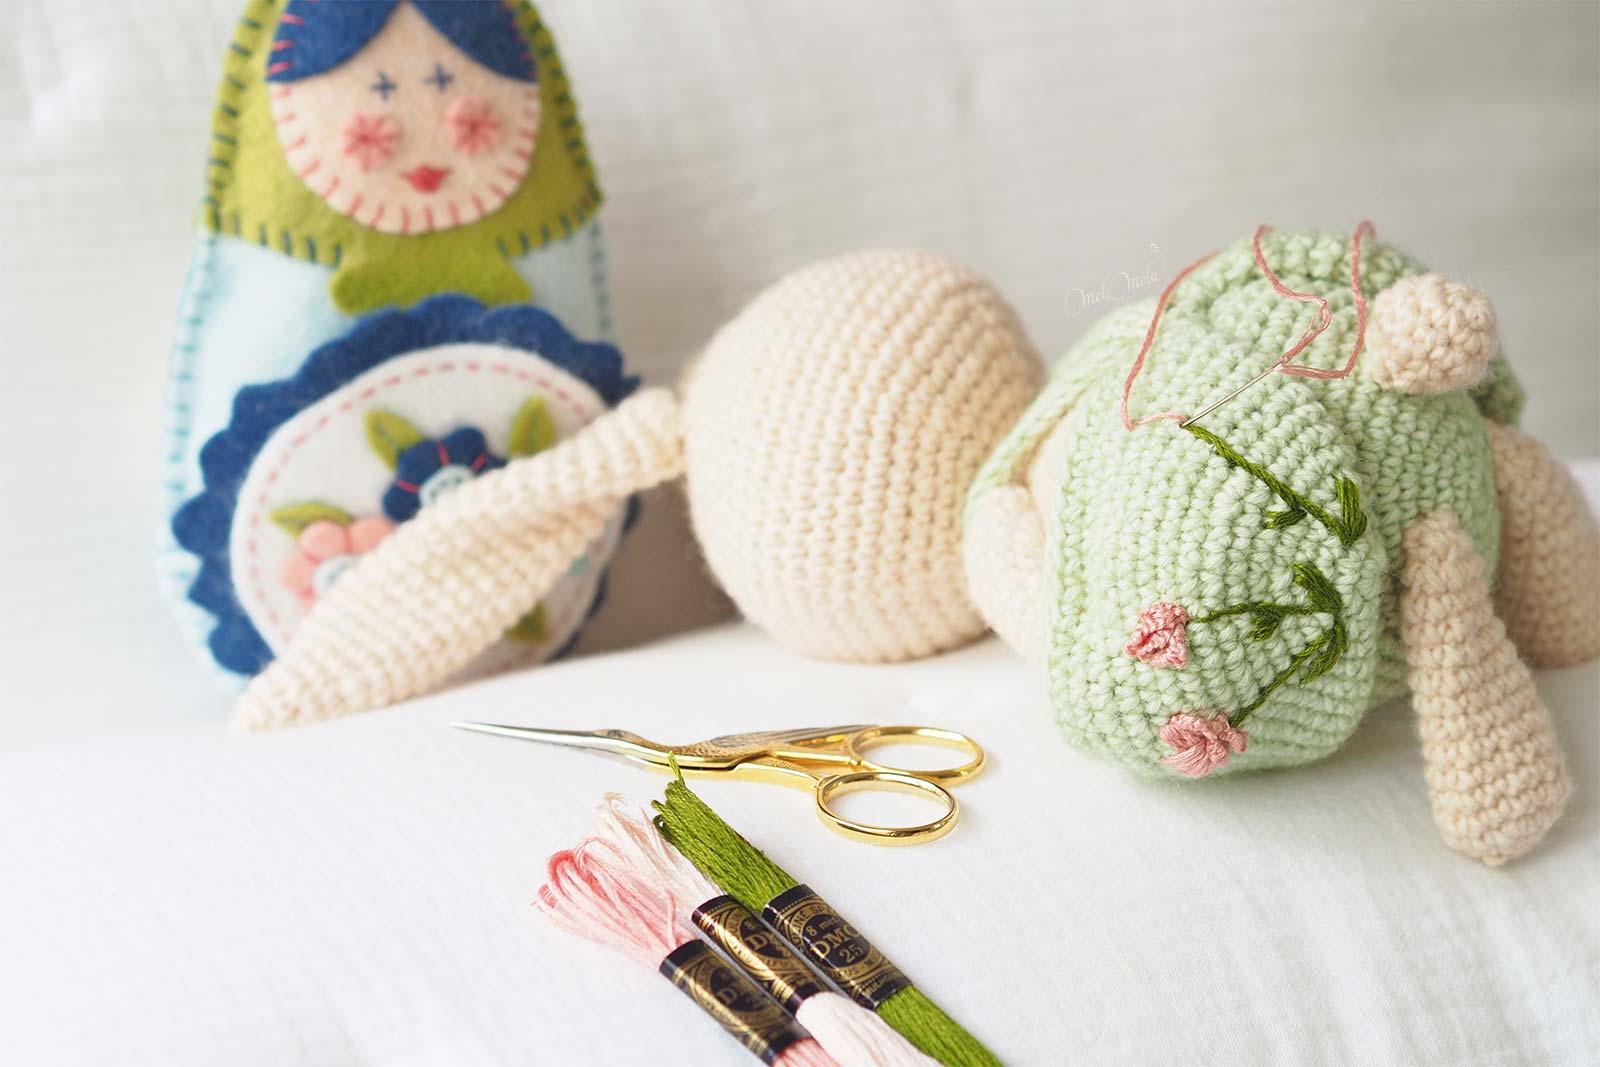 broderie-pivoine-lapin-amigurumi-crochet-laboutiquedemelimelo